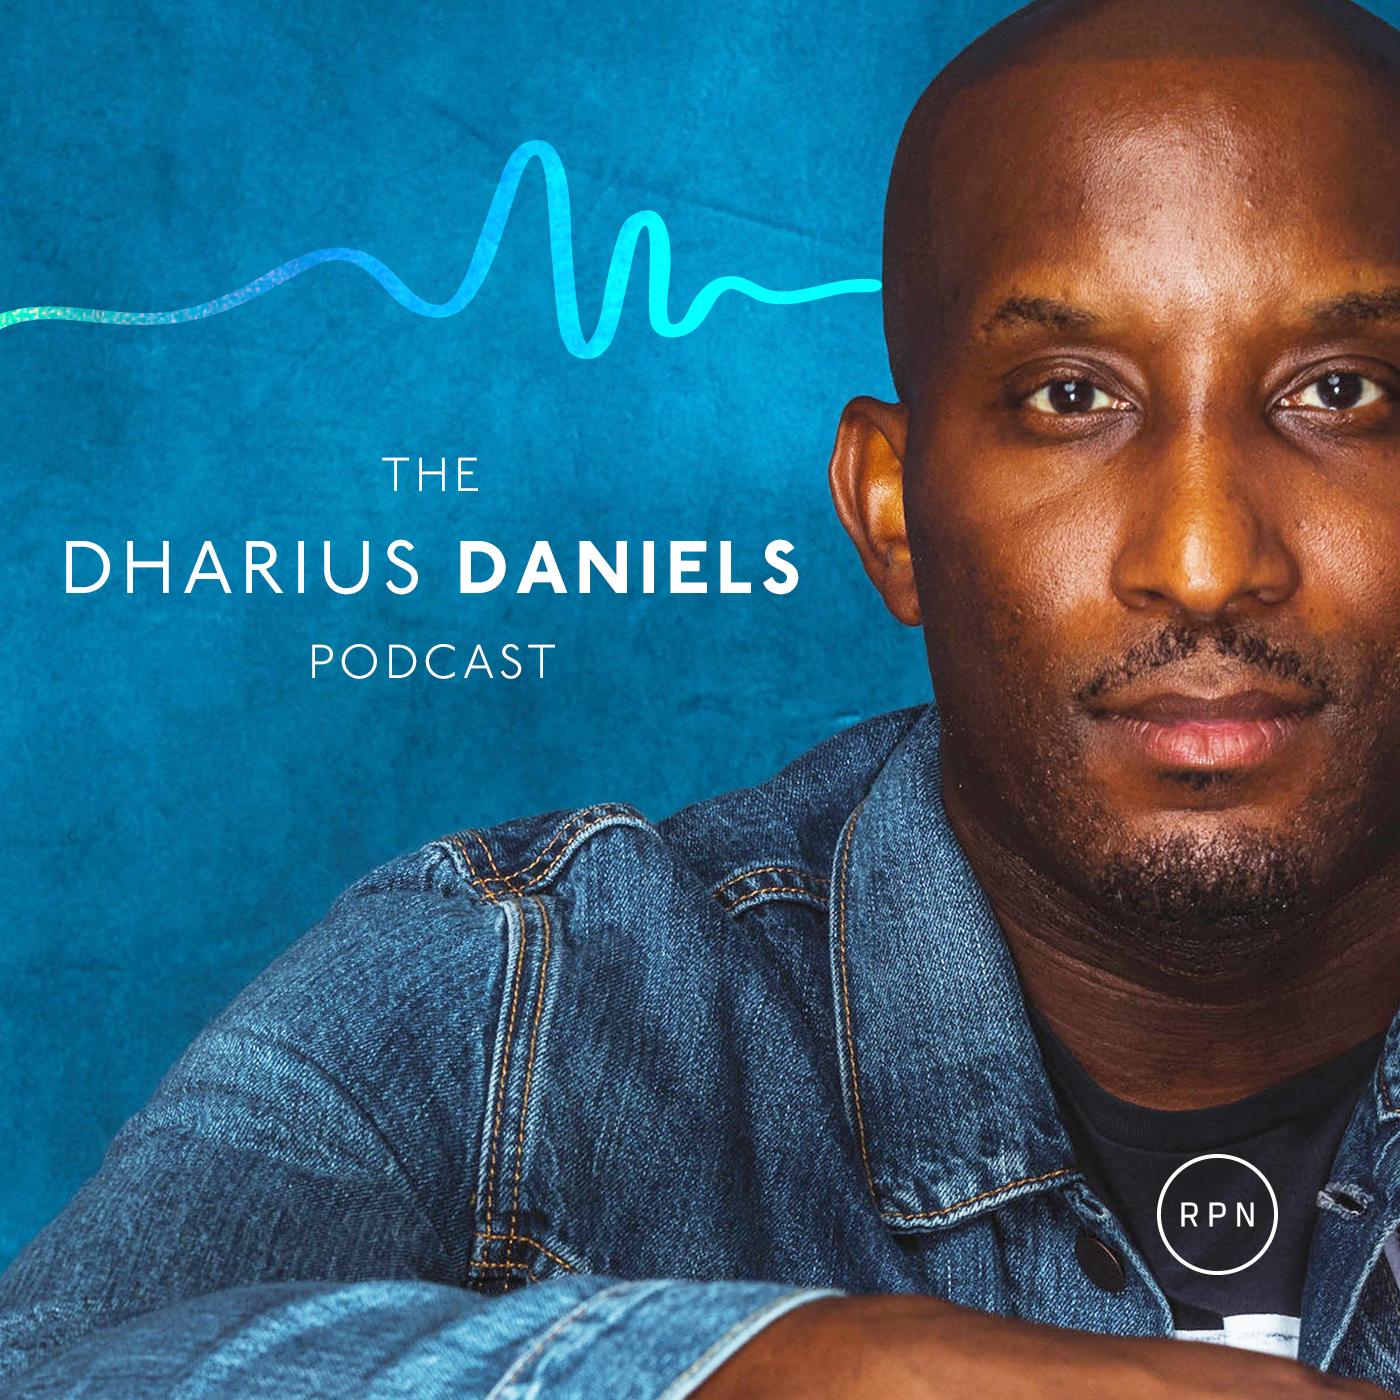 DhariusDanielsPodcast